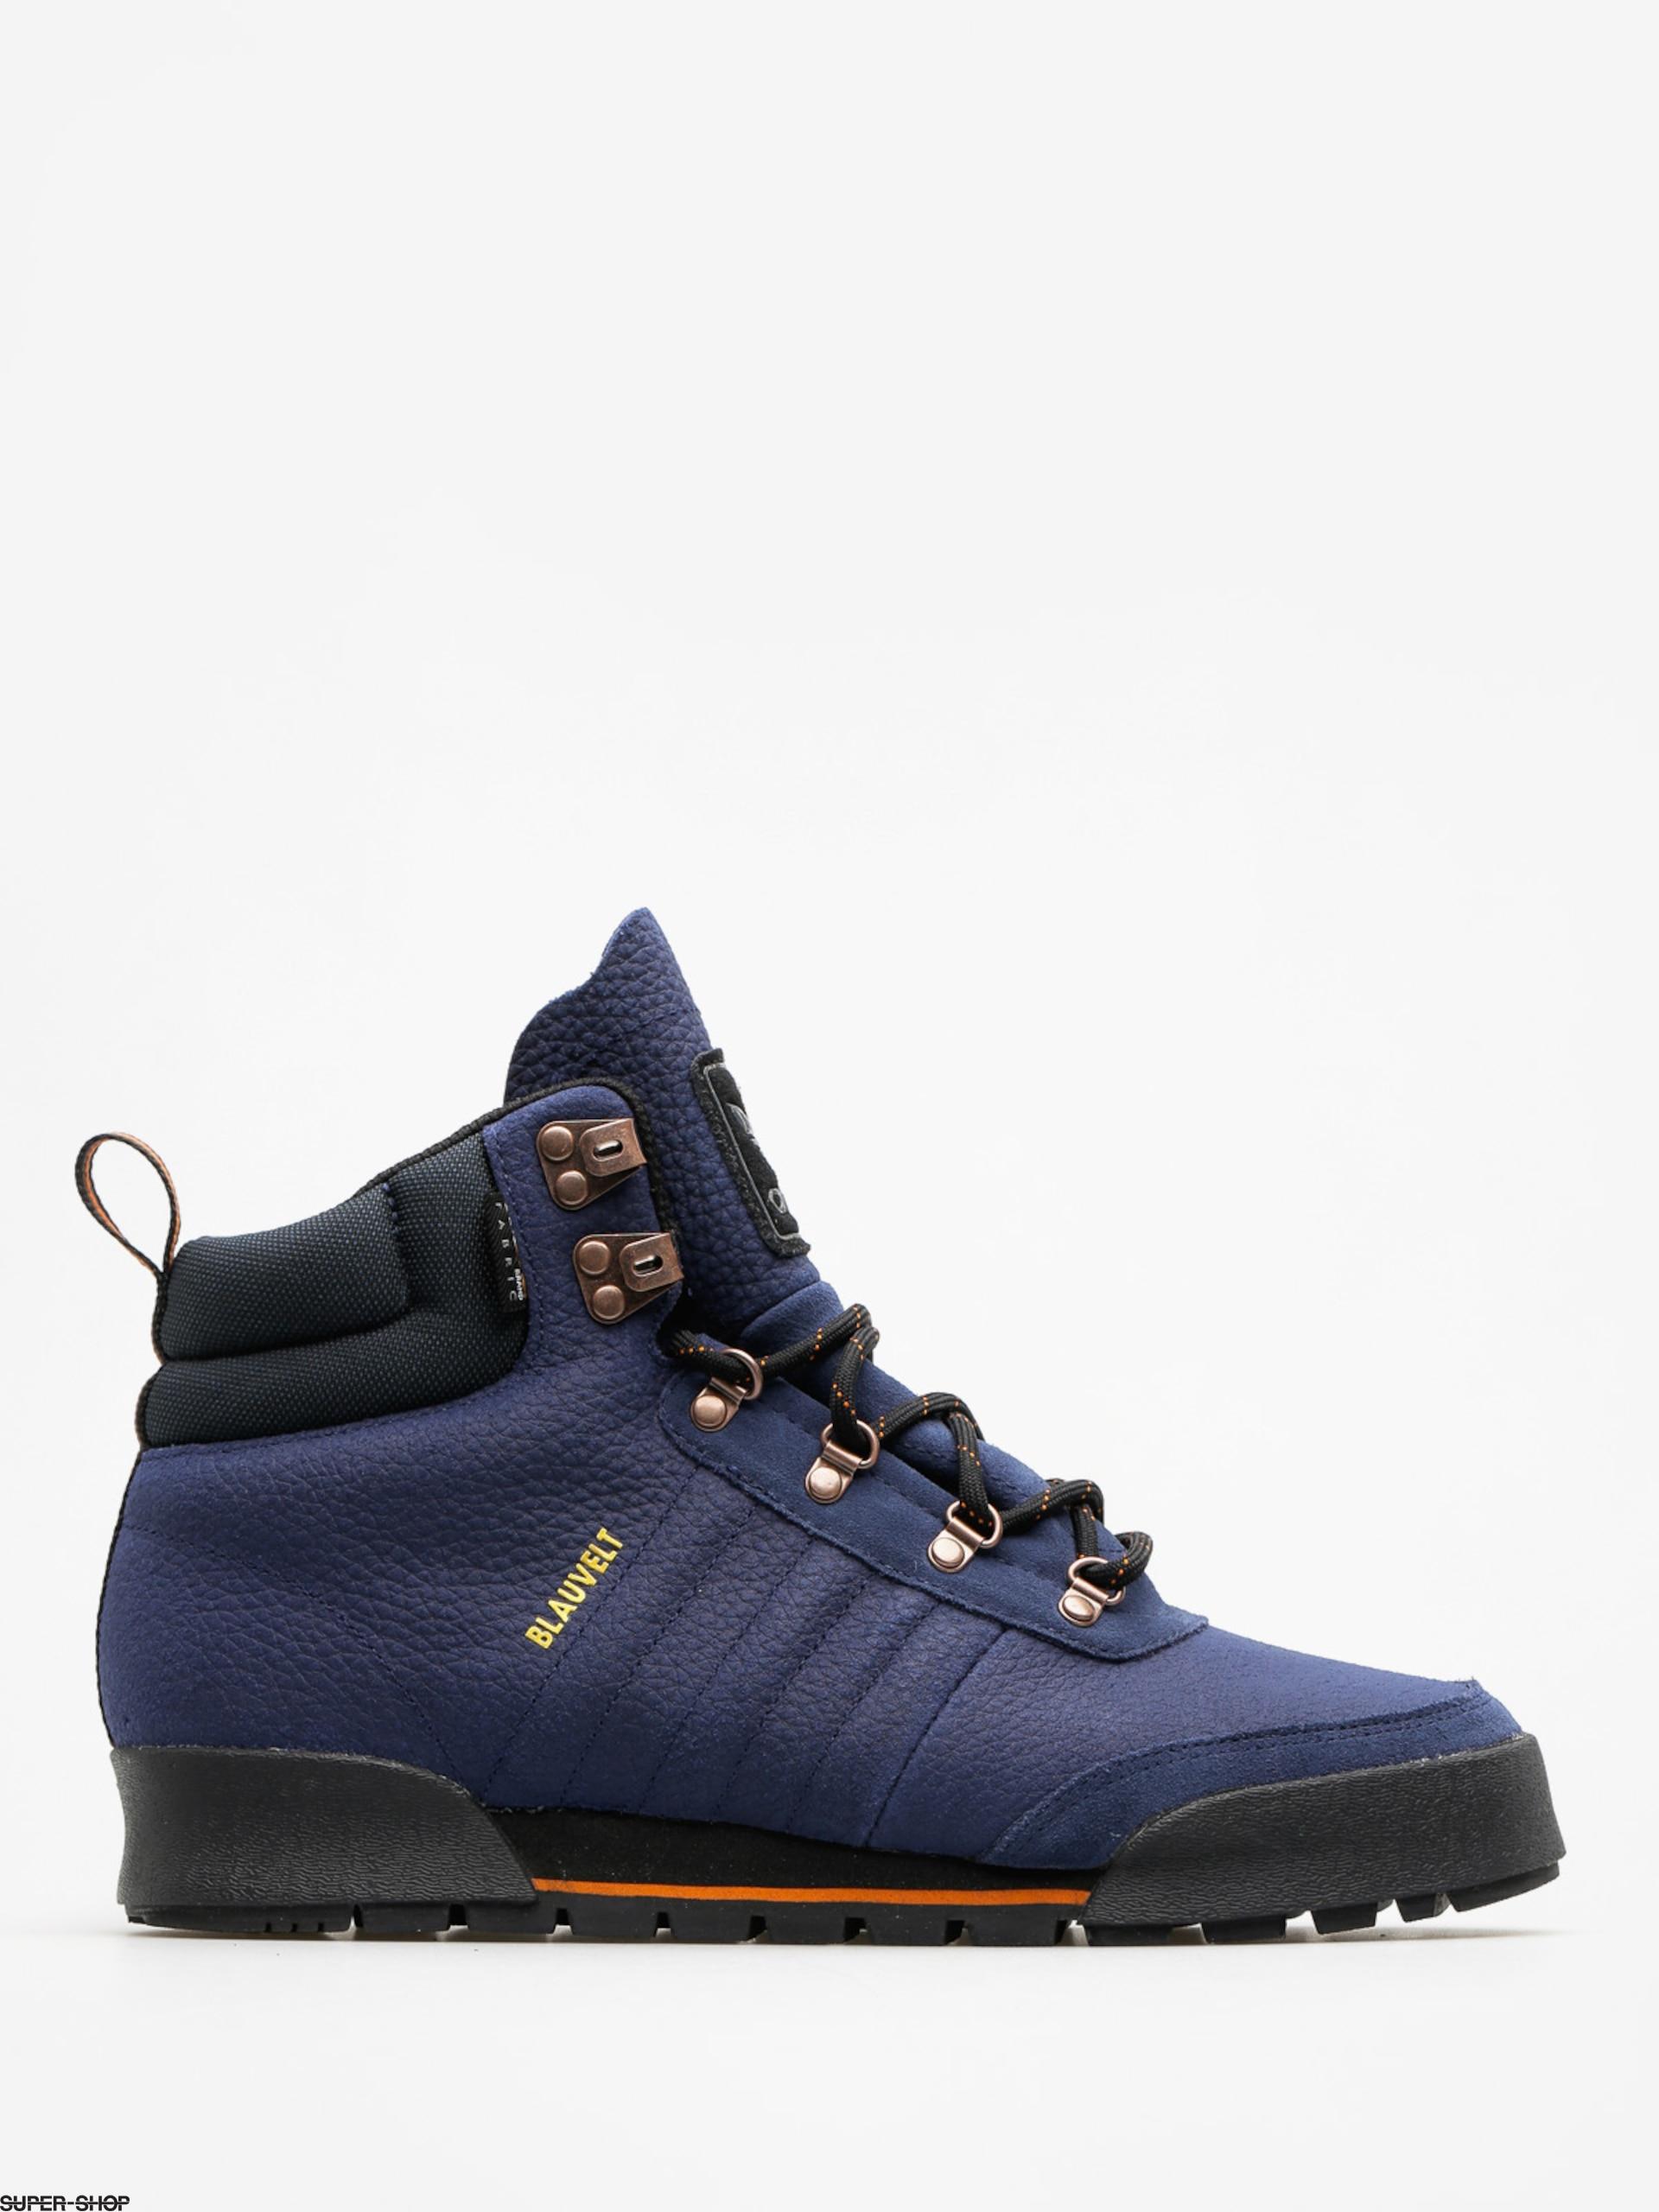 adidas Winter shoes Jake Boot 2.0 (conavy/custom/cblack)